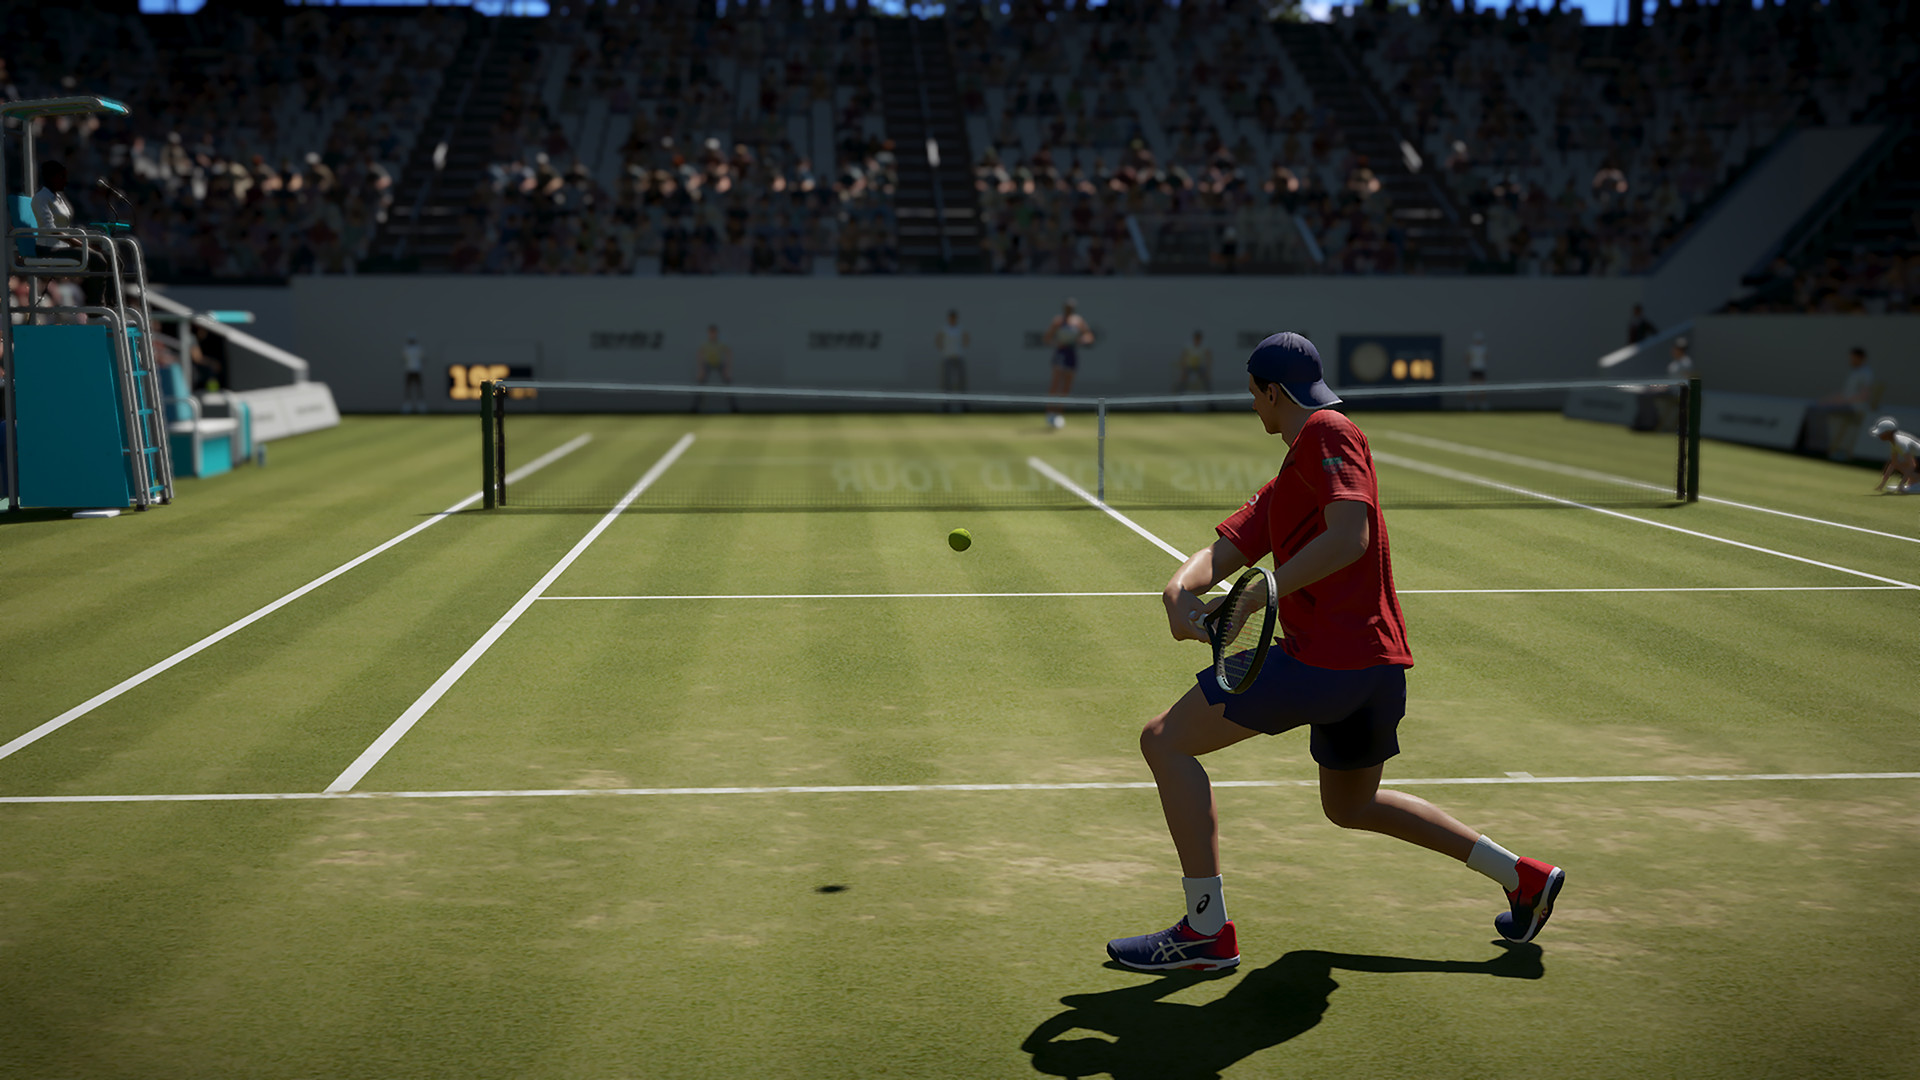 tennis-world-tour-2-pc-screenshot-01